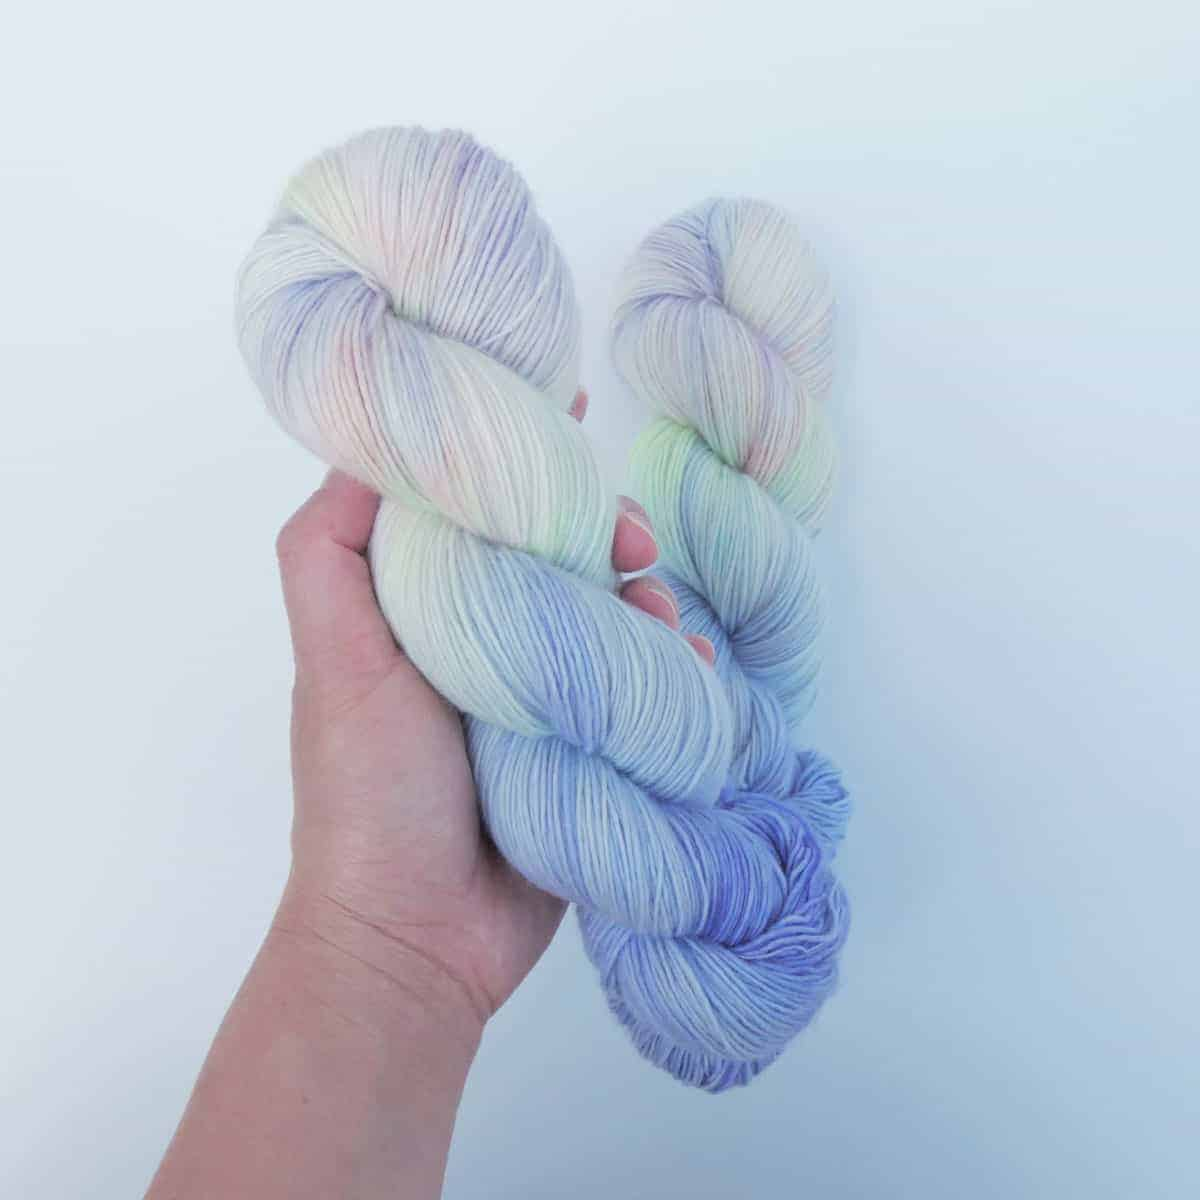 A hand holds neon tie dye yarn.